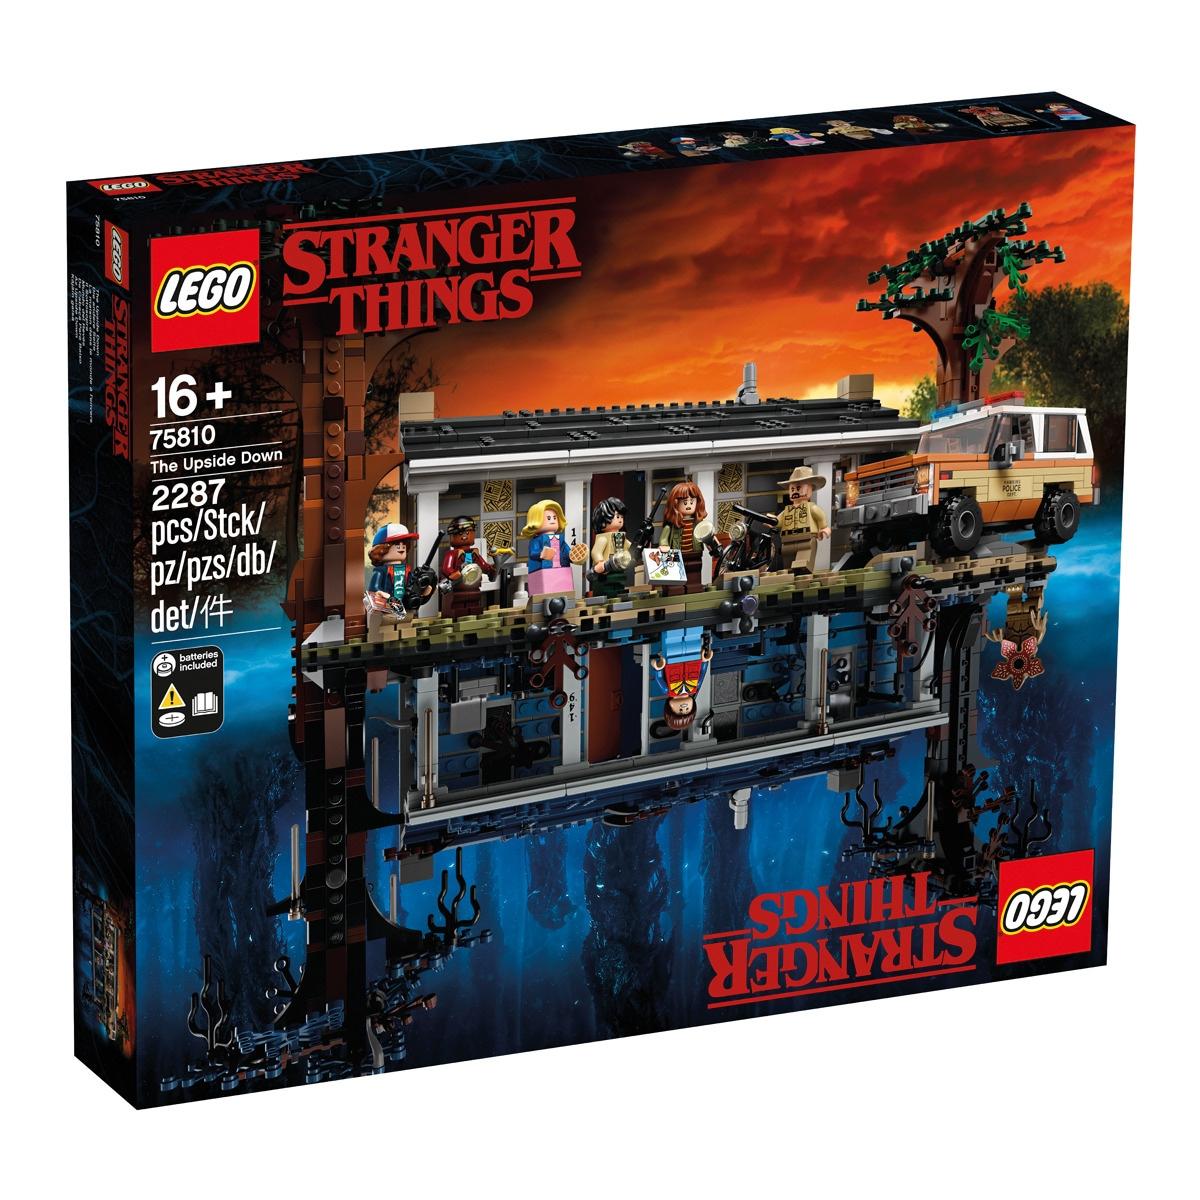 Lego 75810 - Stranger Things The Upside Down